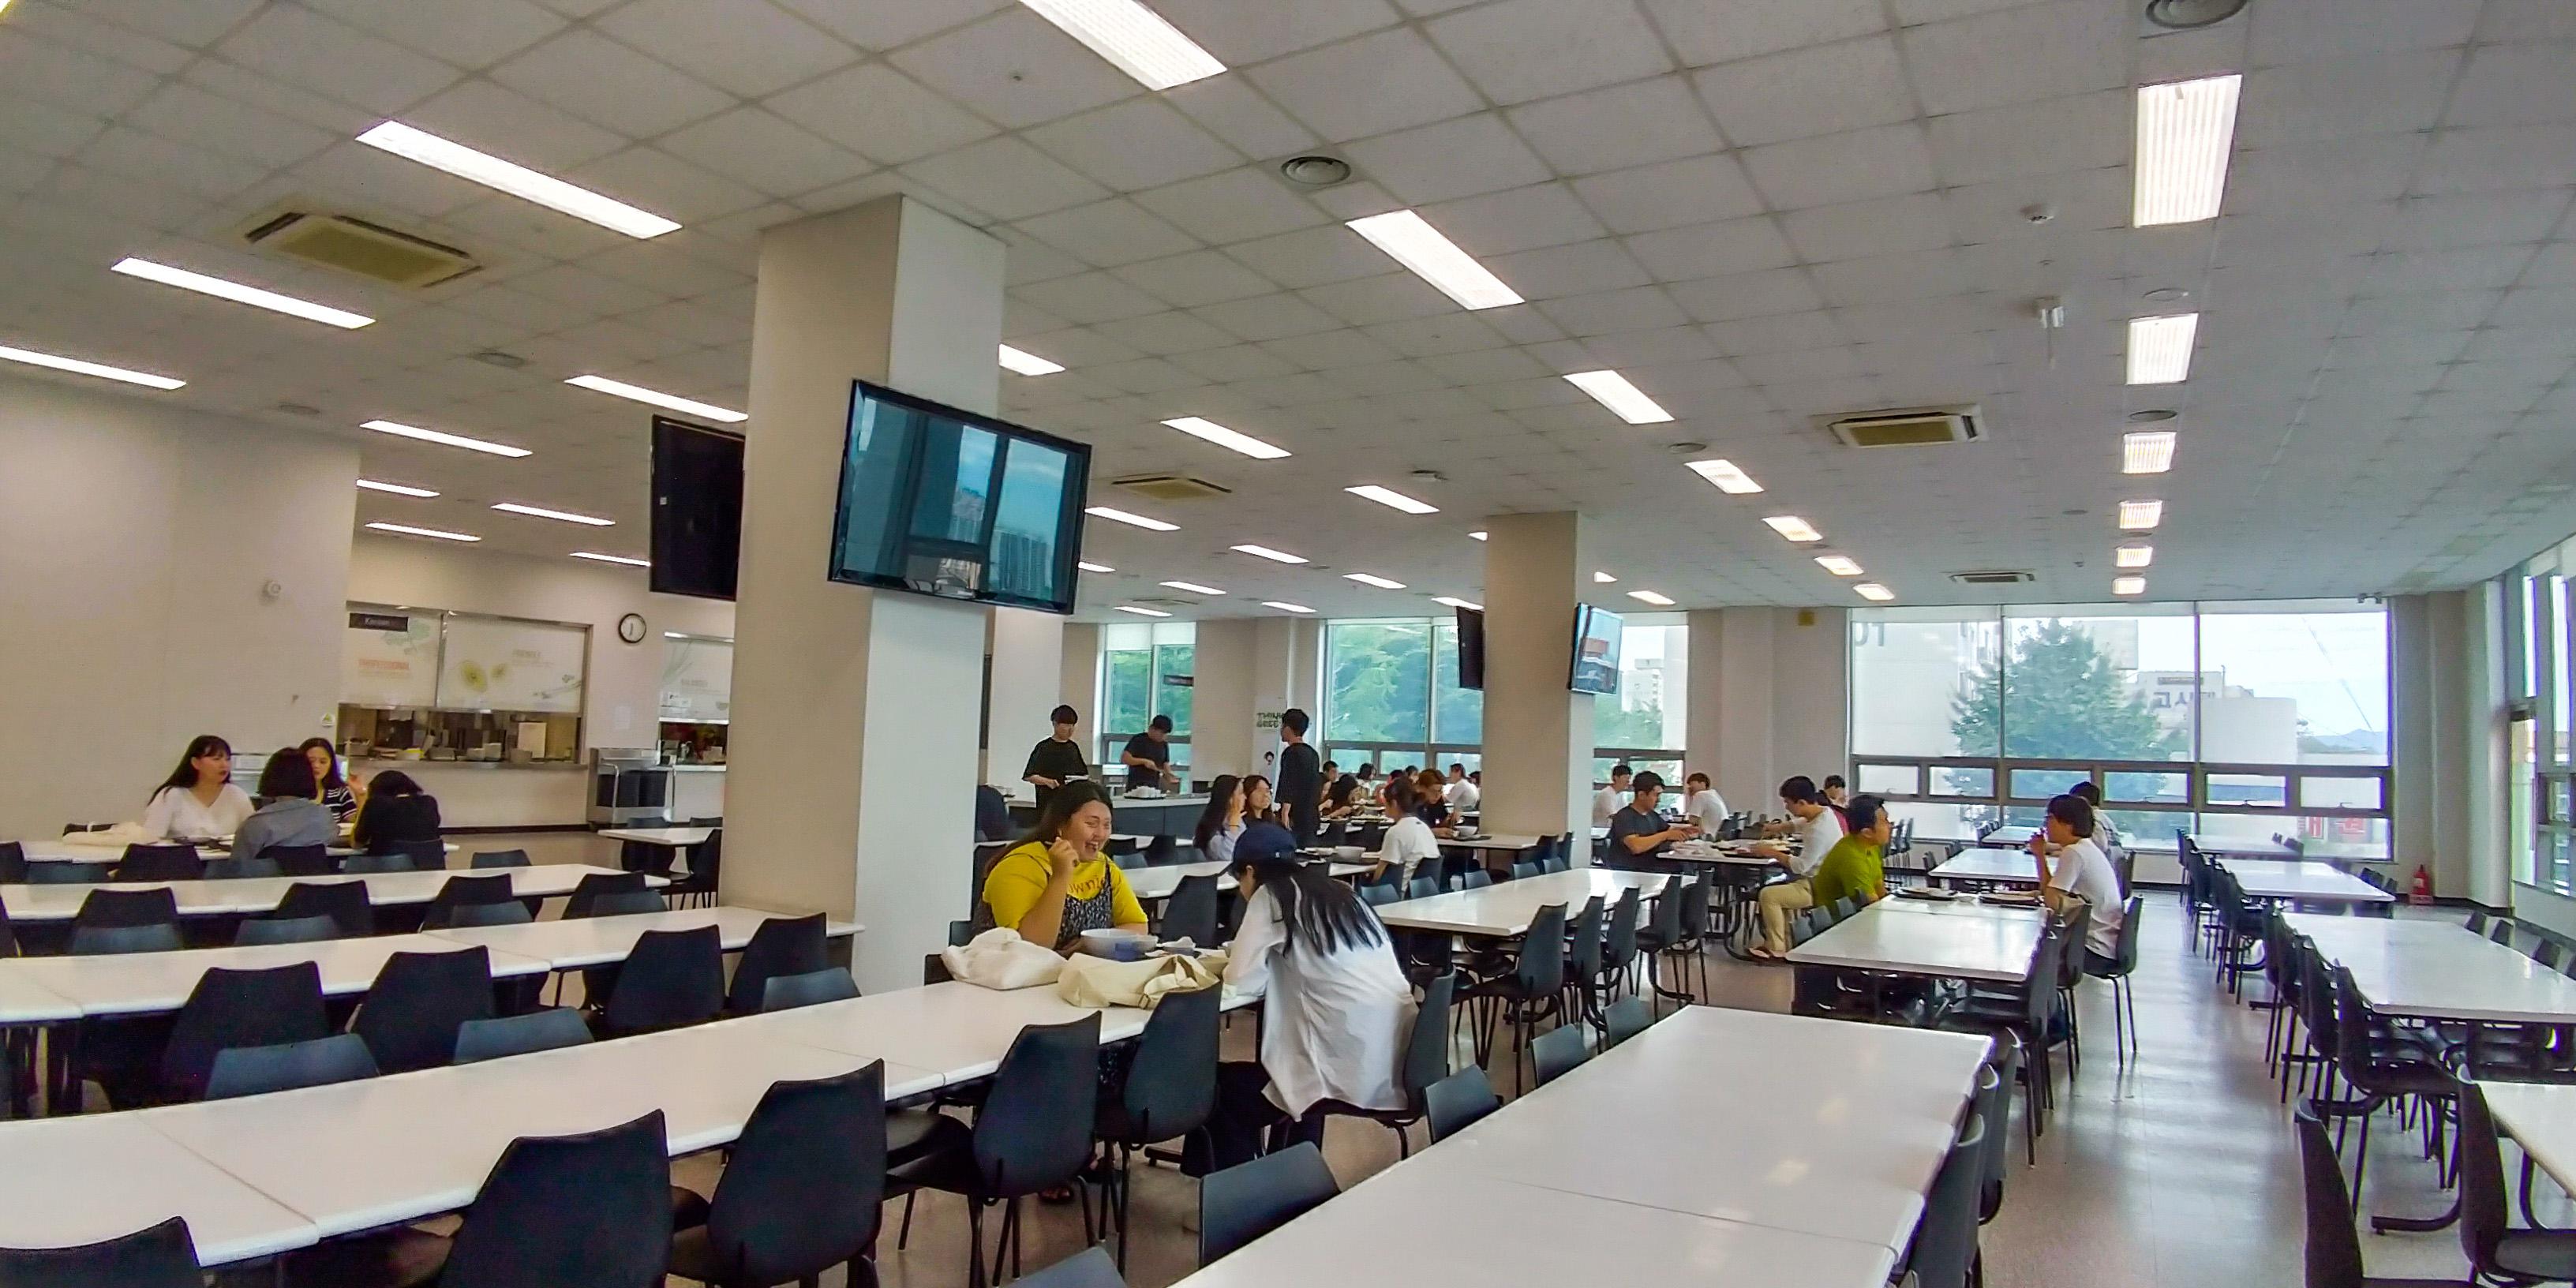 Suasana cafeteria dormitory. Mahasiswa memesan menggunakan mesin lalu mengambil sendiri makanan, side dish, dan minuman. Kemudian memisahkan peralatan makanan kotor pada tempatnya setelah selesai